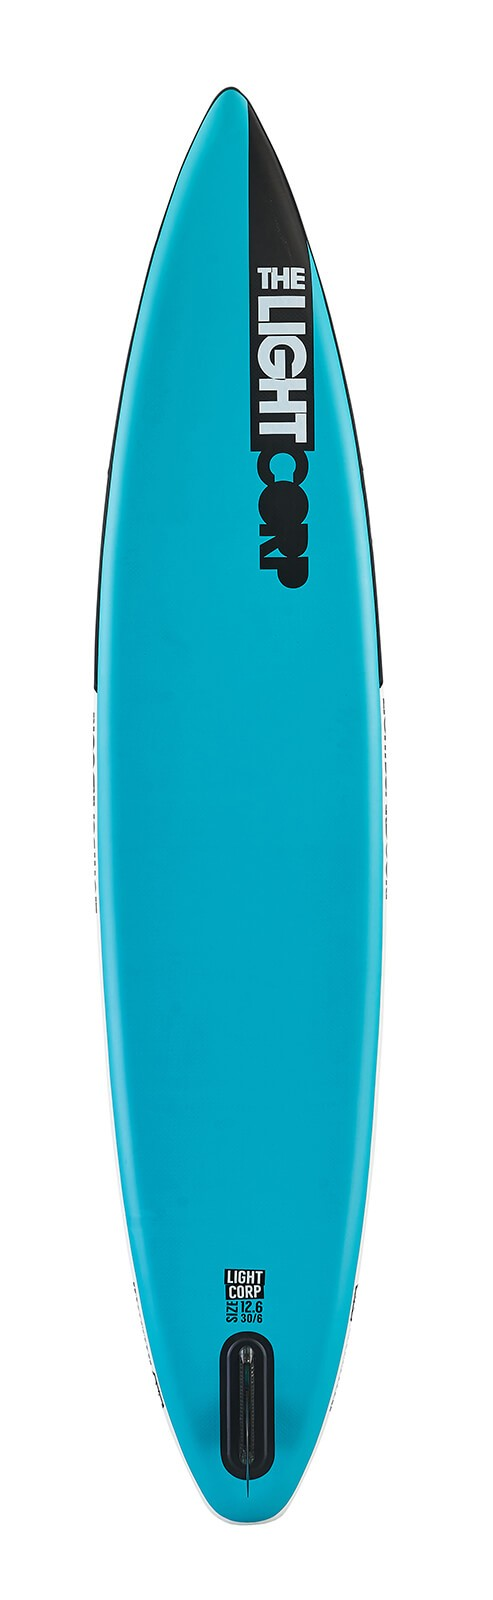 Light Board The Blue MFT Tourer 12'6''